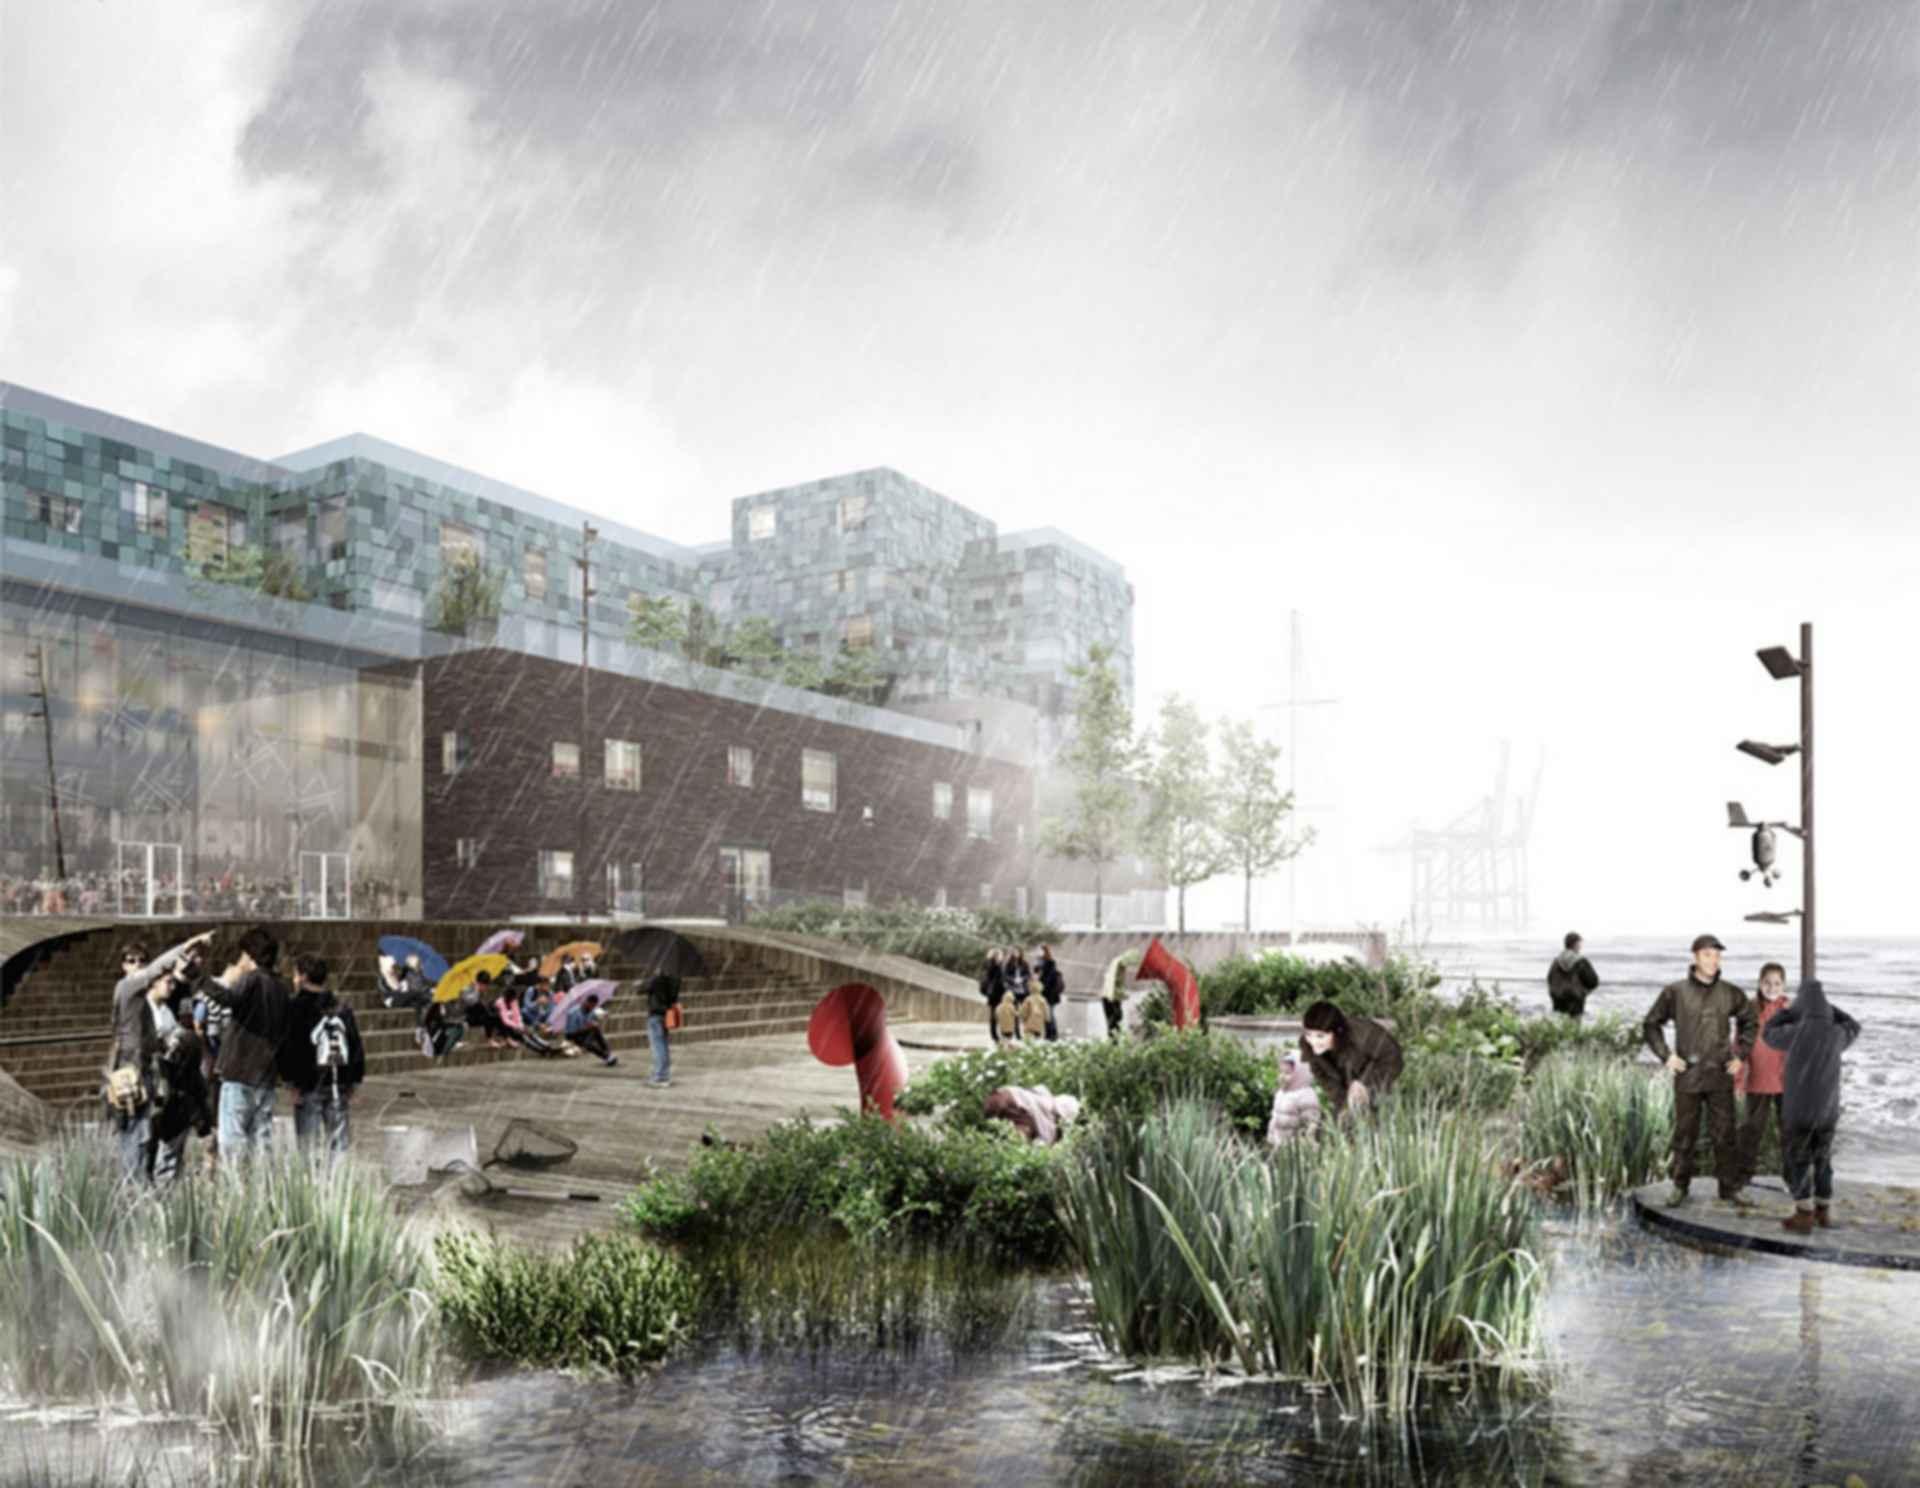 The Nordhavn Islands - concept design